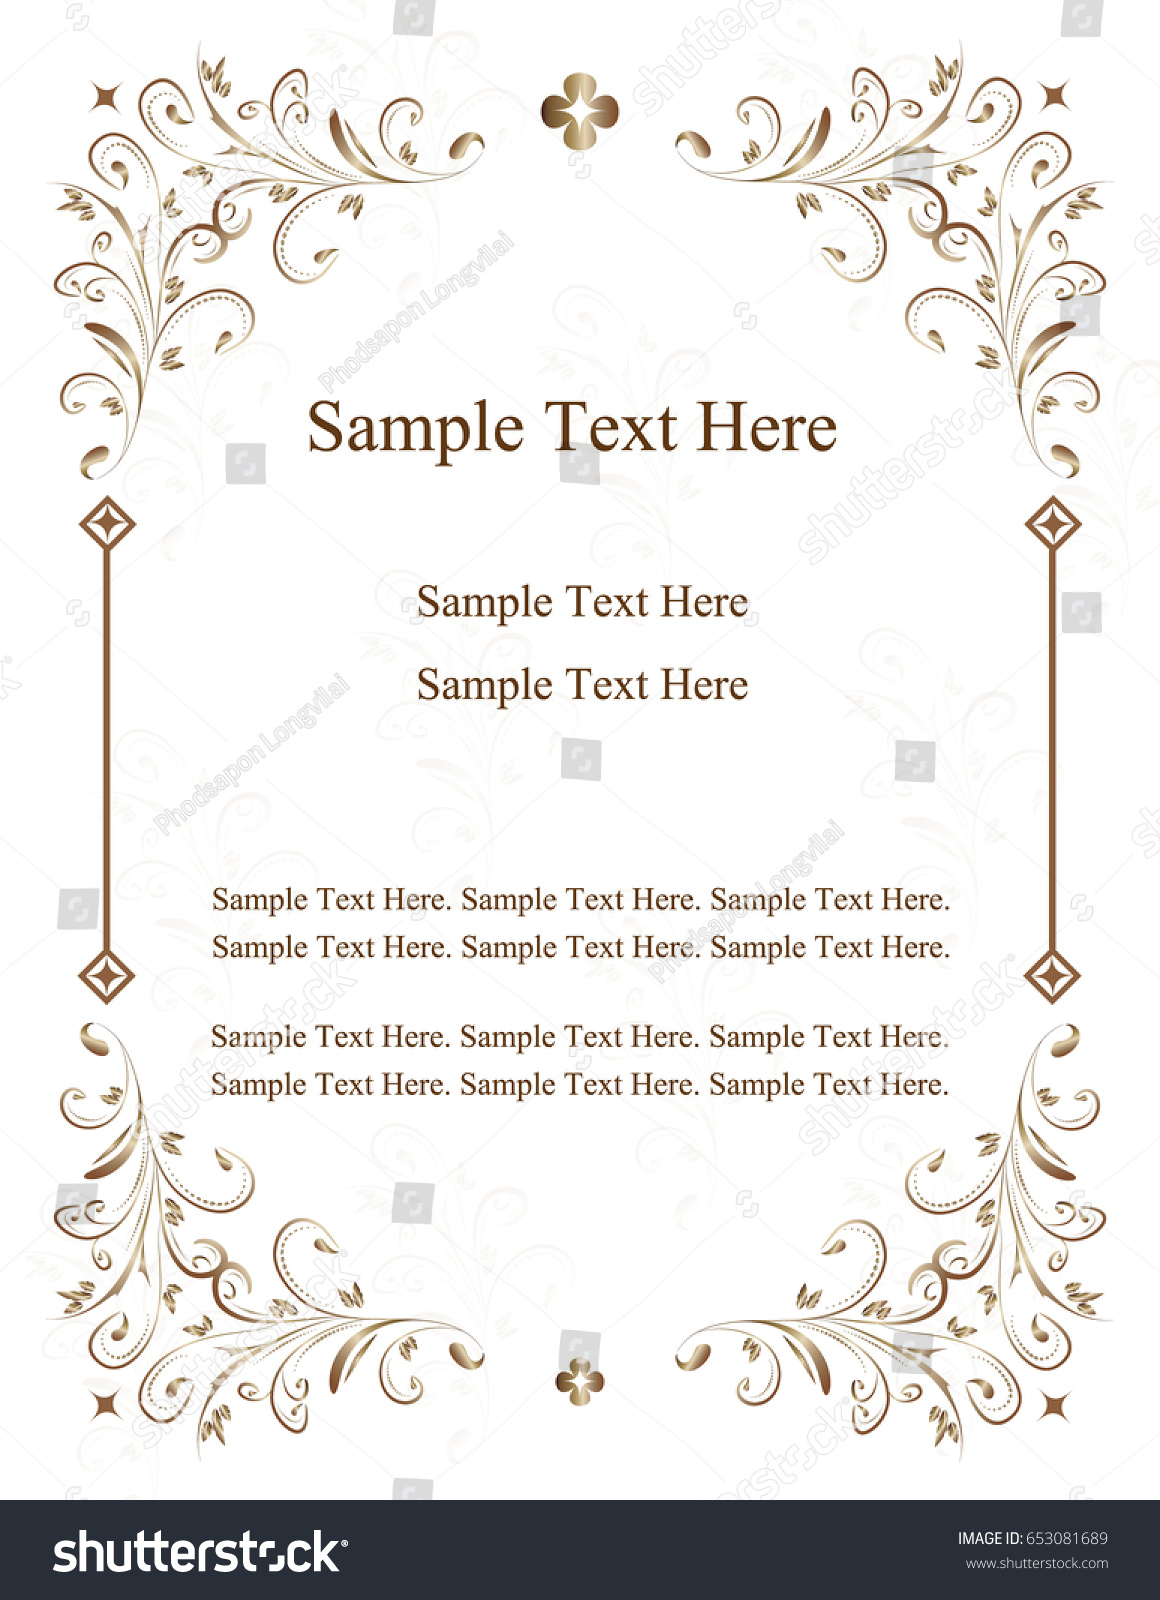 Wedding card greeting cards wedding invitation stock vector wedding card greeting cards wedding invitation invitation with victorian ornaments beautiful kristyandbryce Choice Image